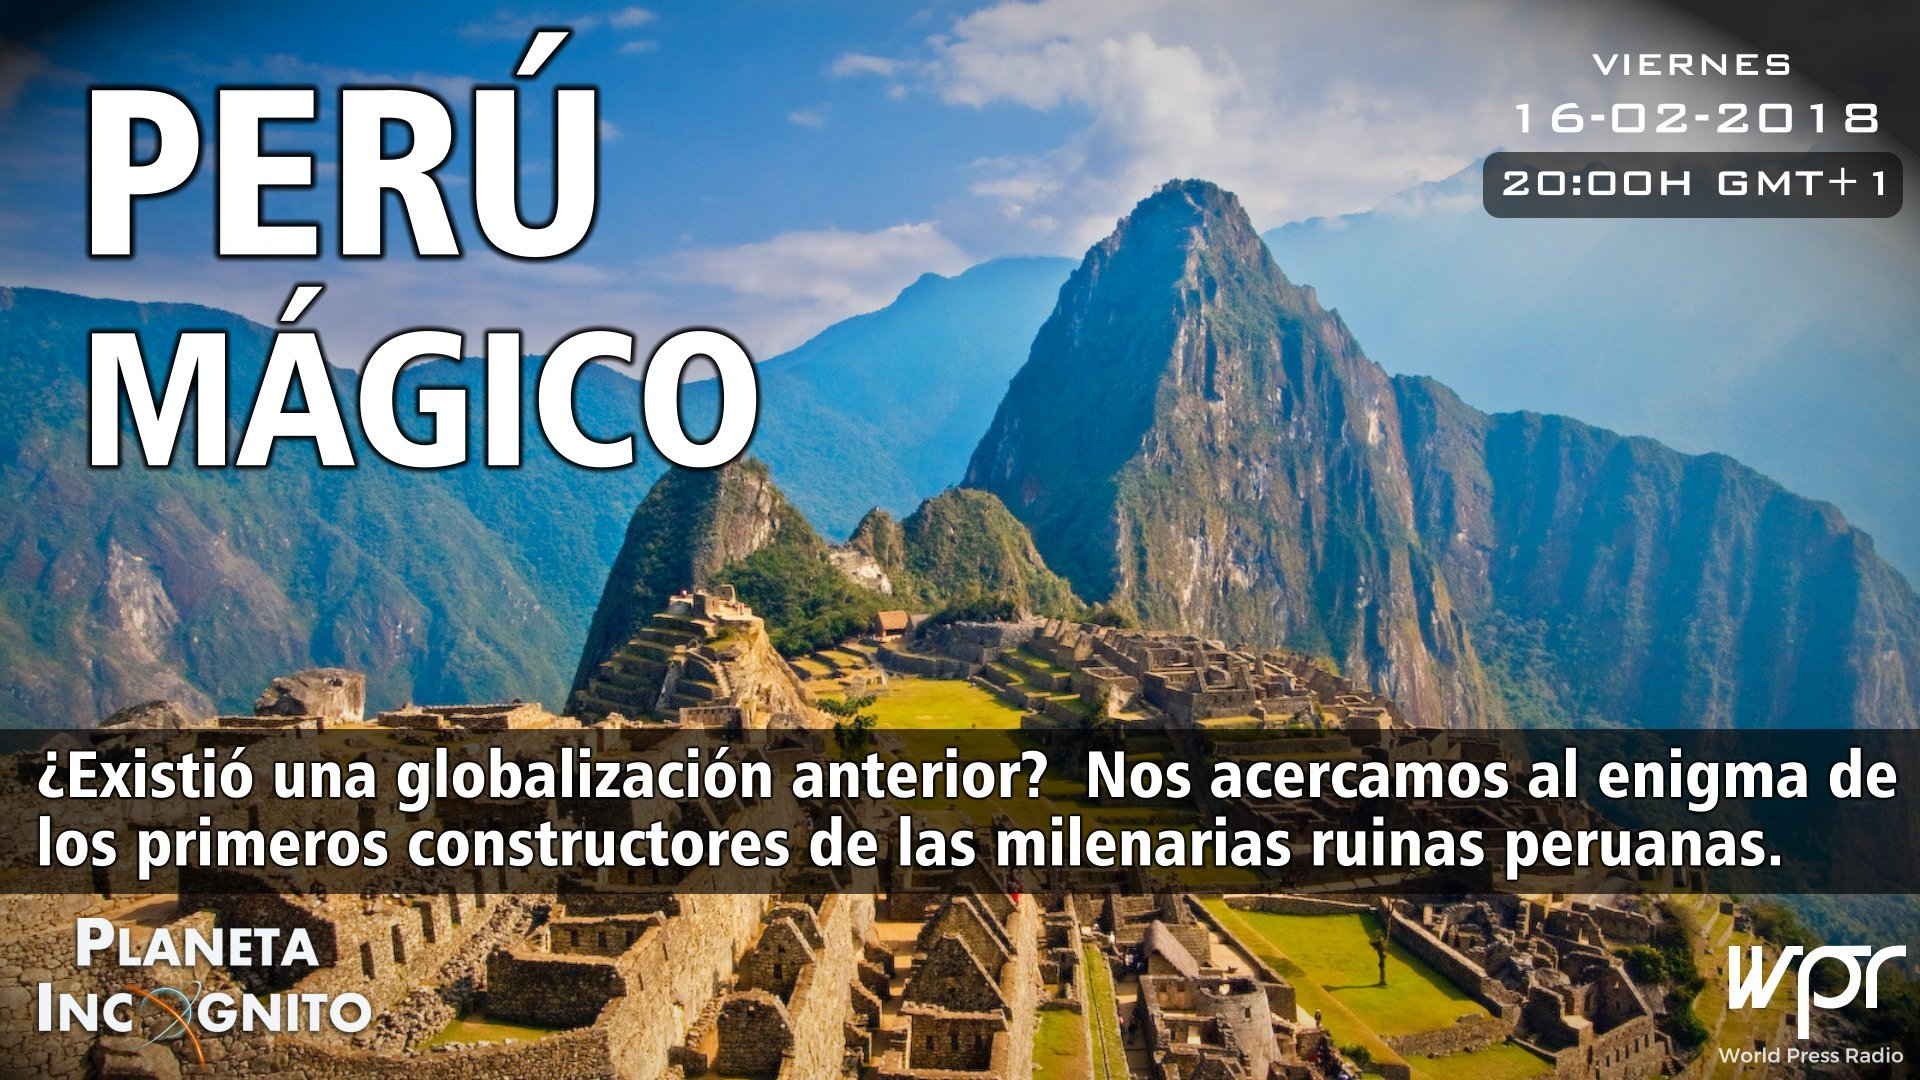 Banner, Planeta Incógnito